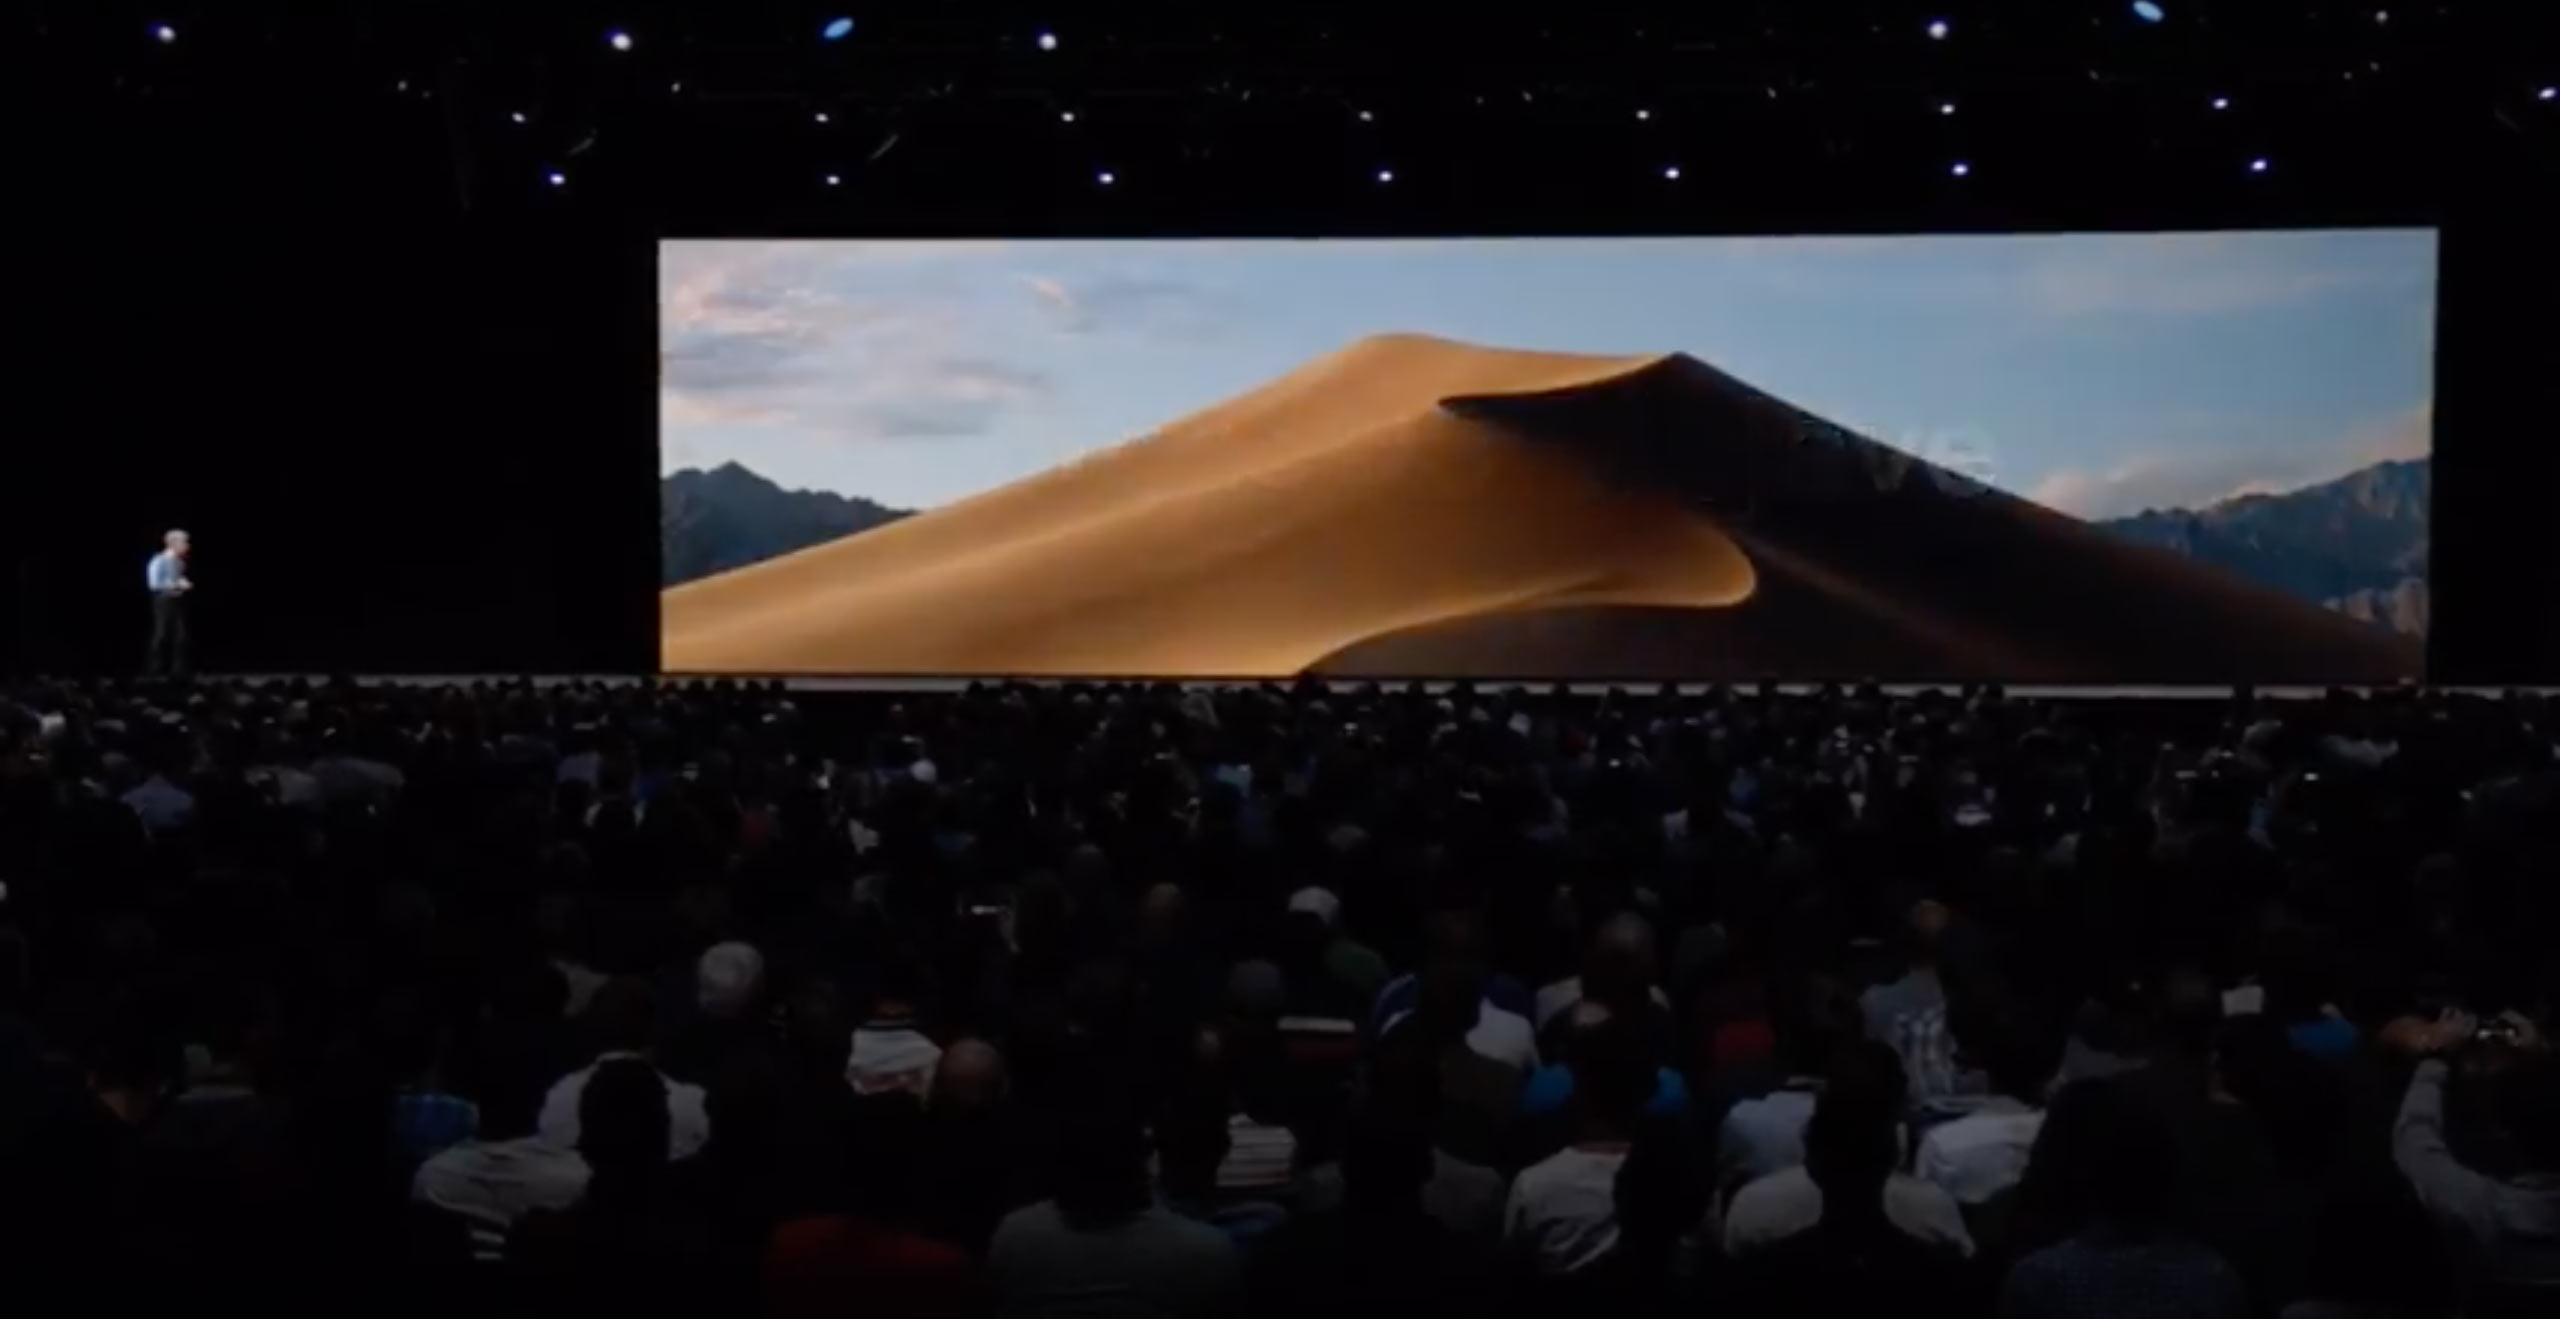 MacOS:Mojaveのダークモードビフォーの写真